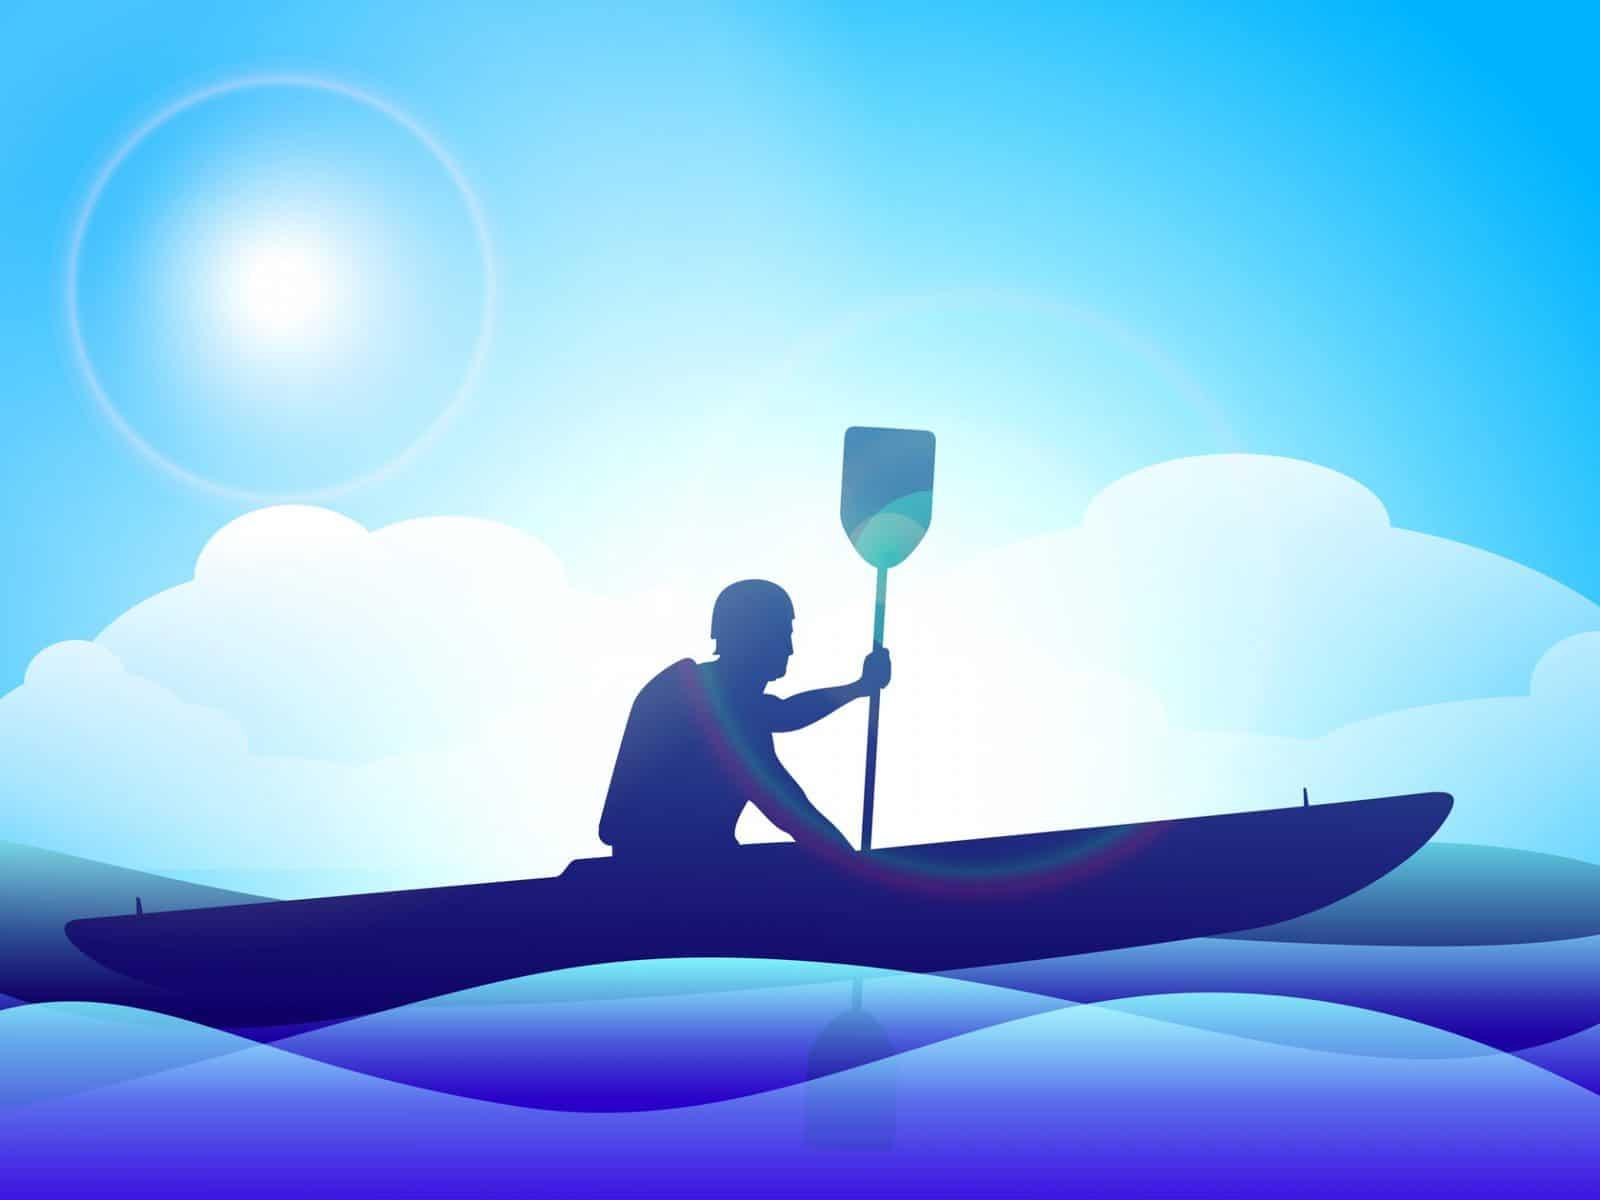 llustration of man doing kayaking in sea